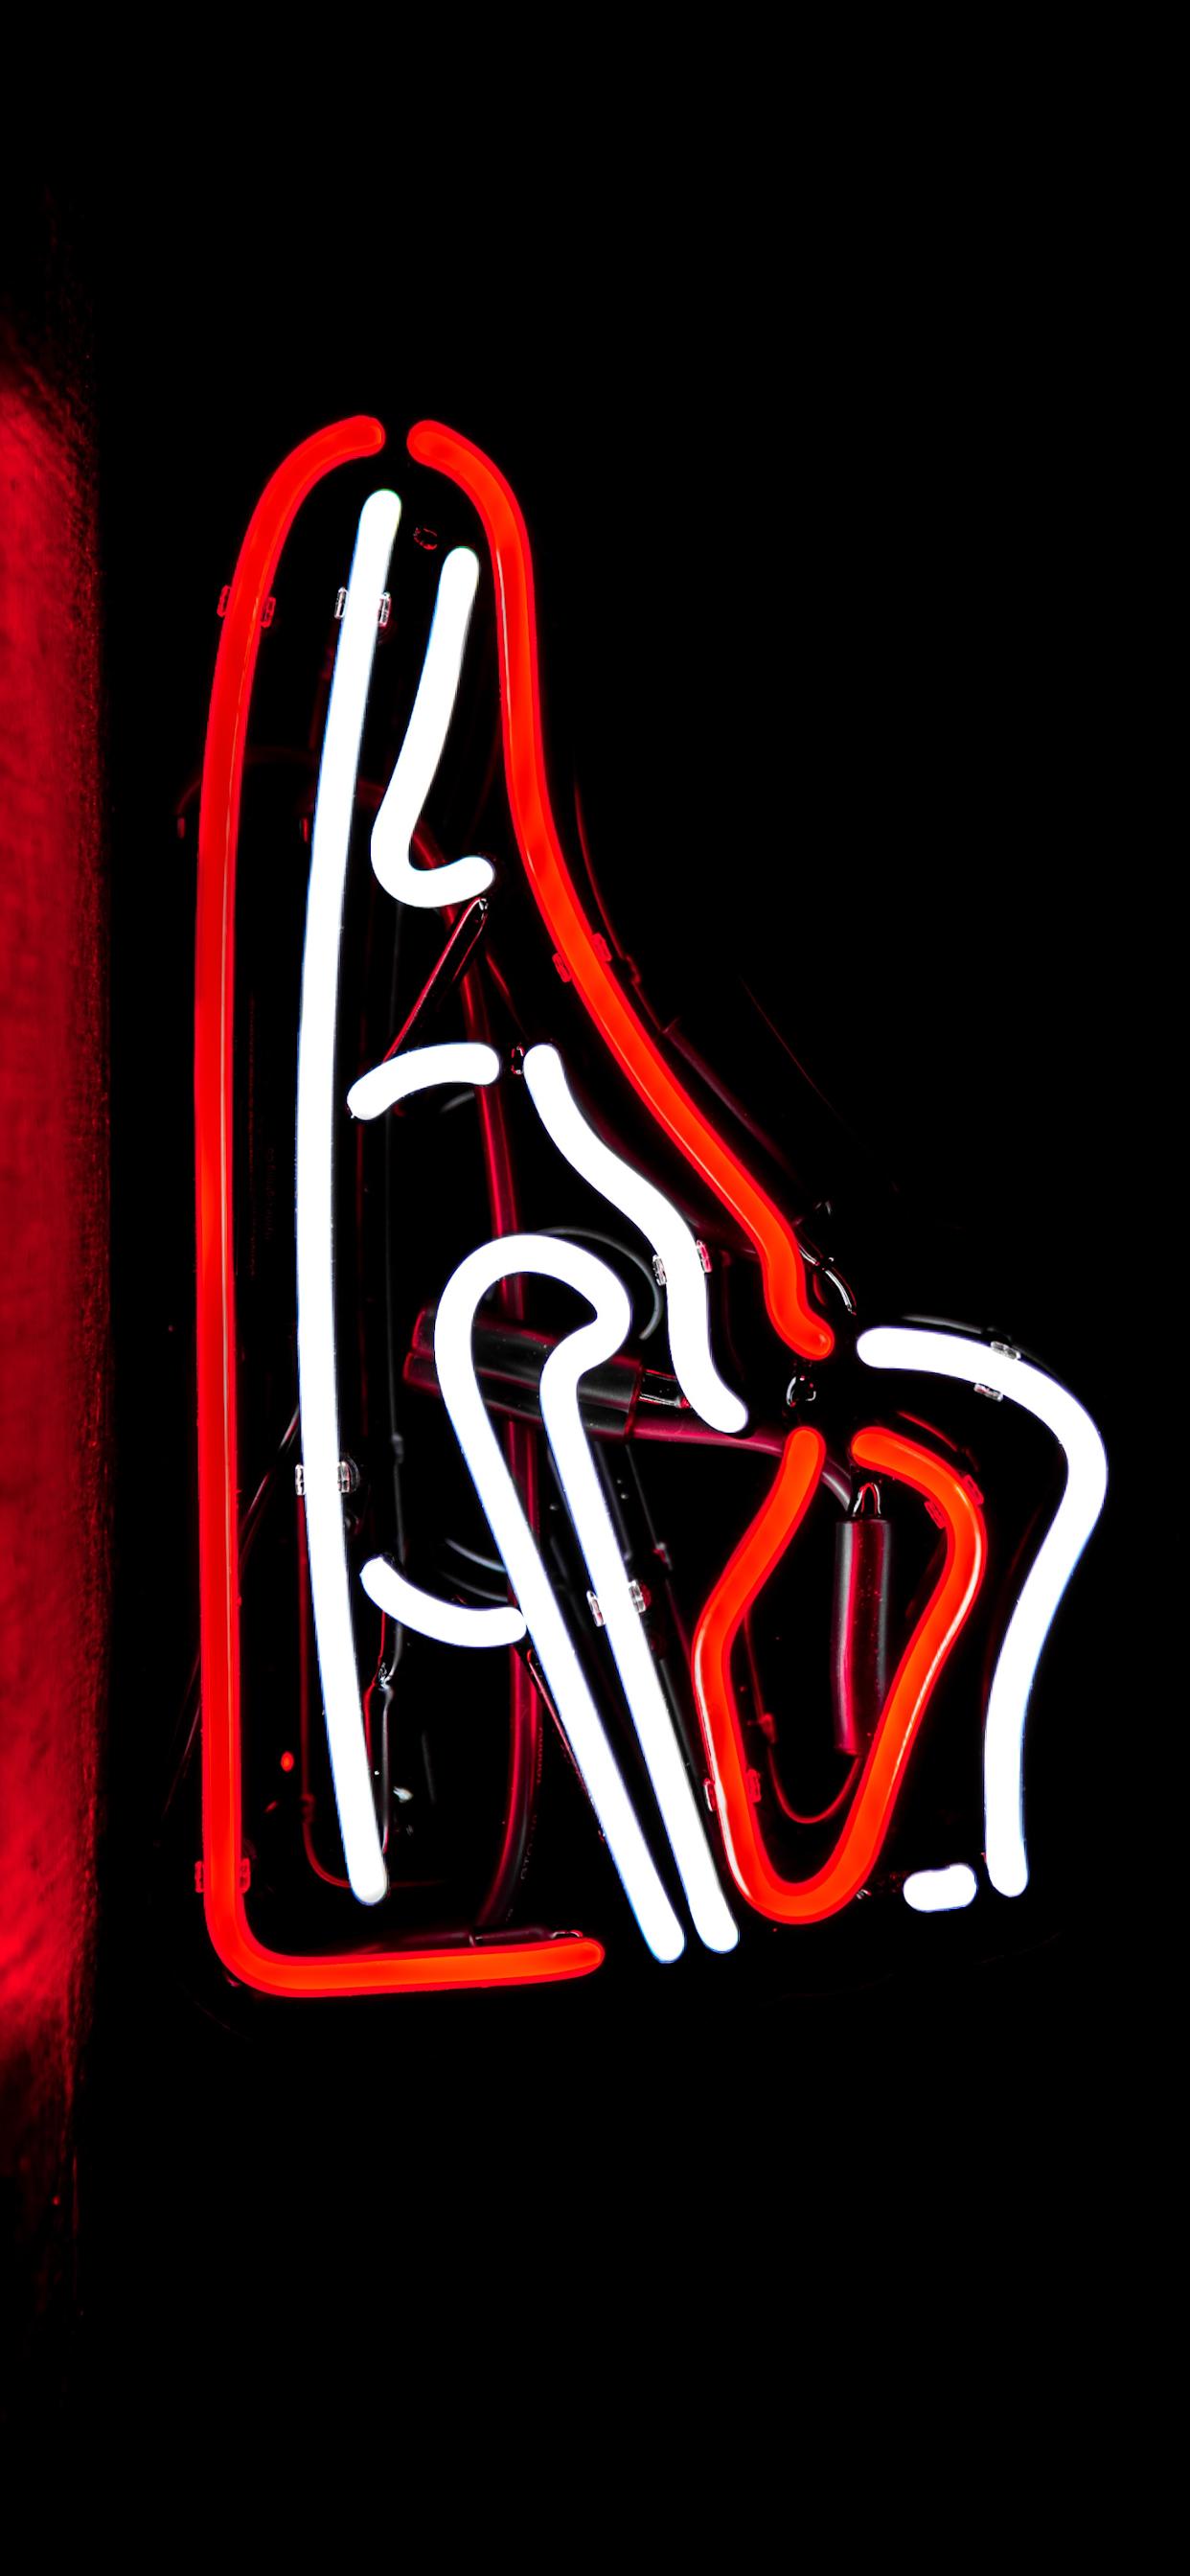 iPhone wallpapers neon sign jordan retro 1 Fonds d'écran iPhone du 29/01/2020